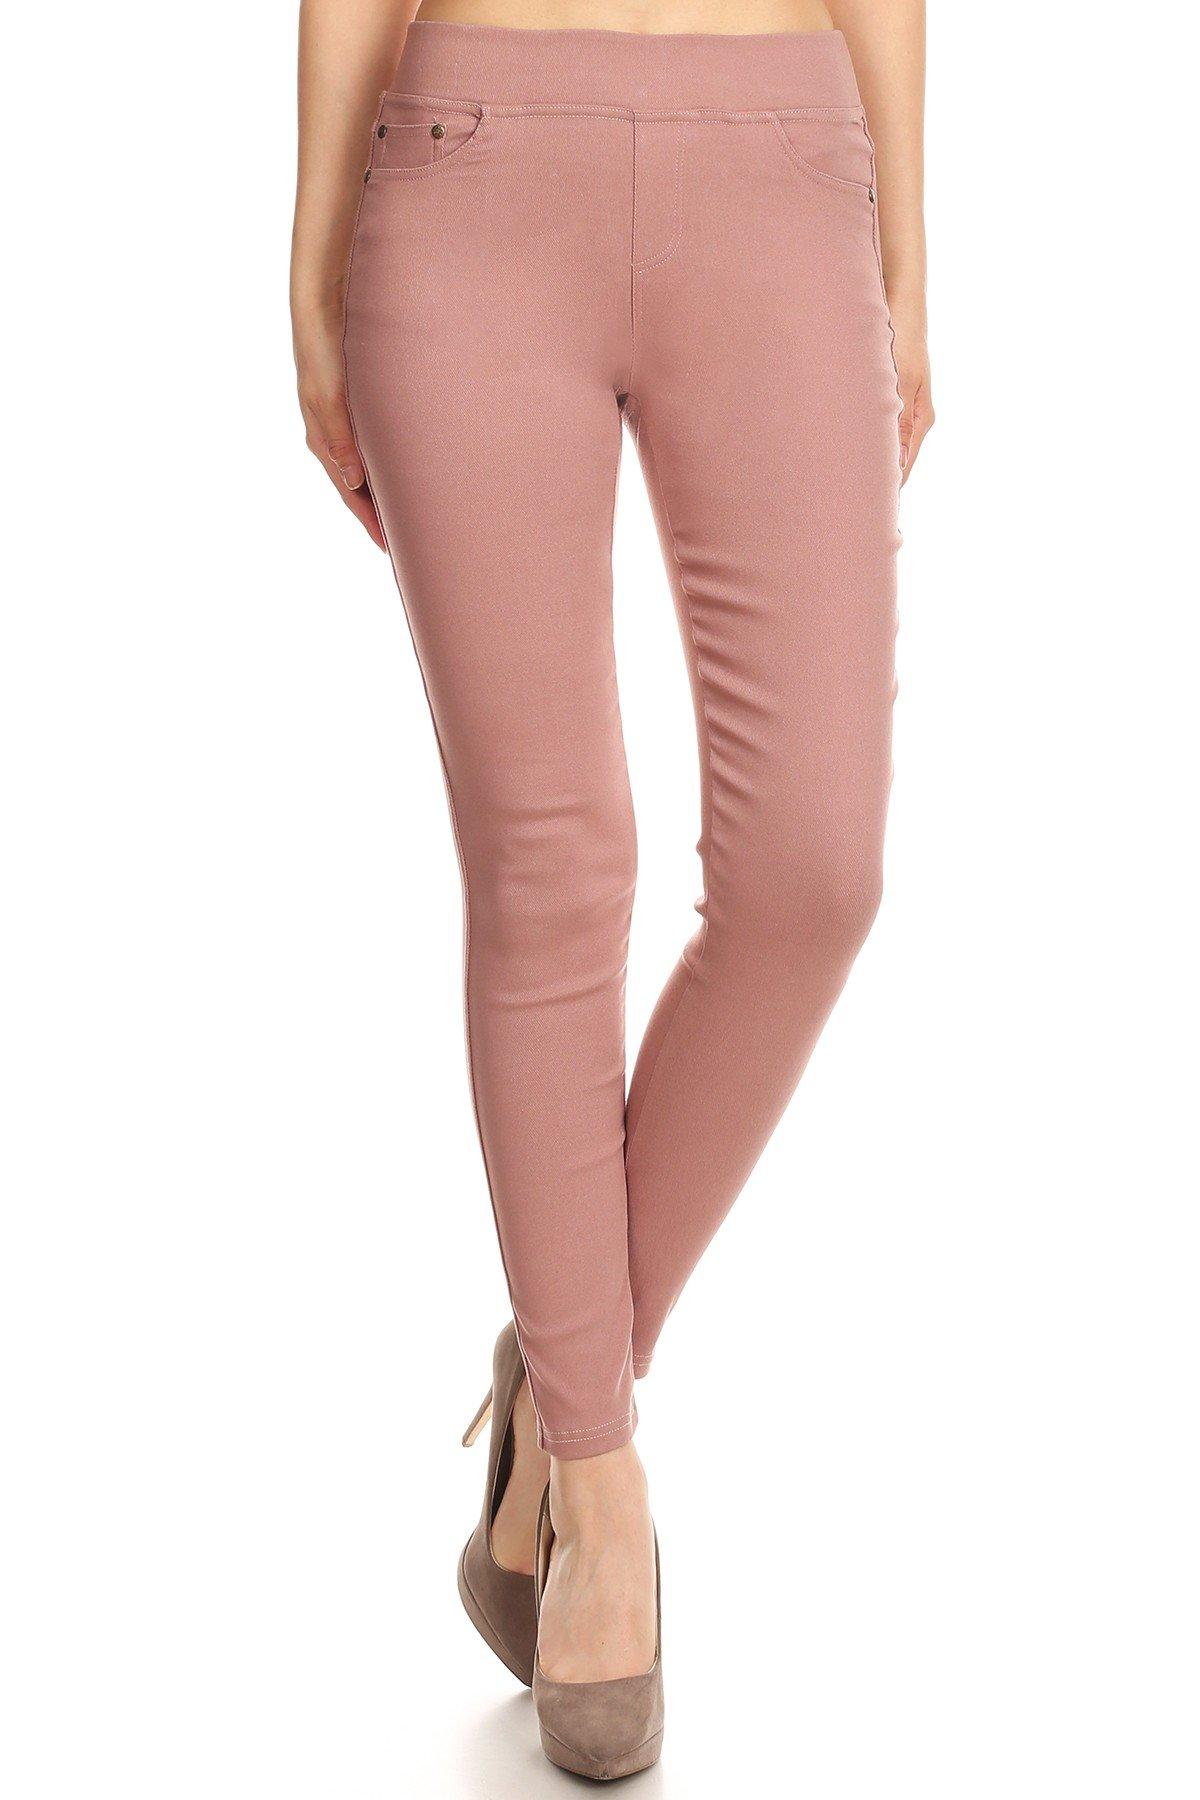 MissMissy Women's Casual Color Denim Slim Fit Skinny Elastic Waist Band Spandex Jeggings Ankle Jeans Pants (Small, Pink)